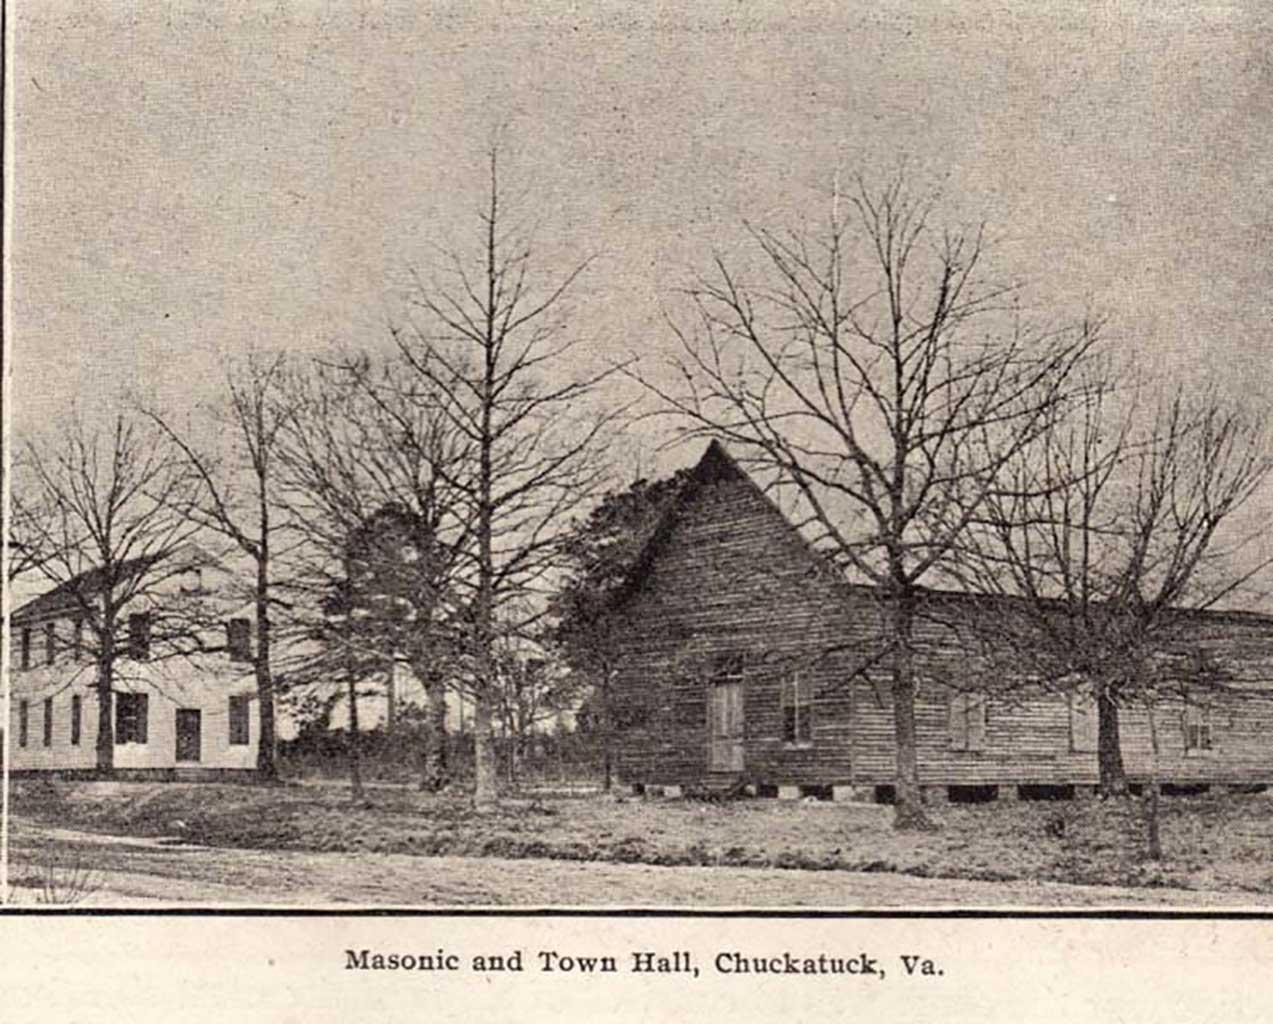 masonic-and-town-hall-in-chuckatuck-tmp6c2e_1024x7681